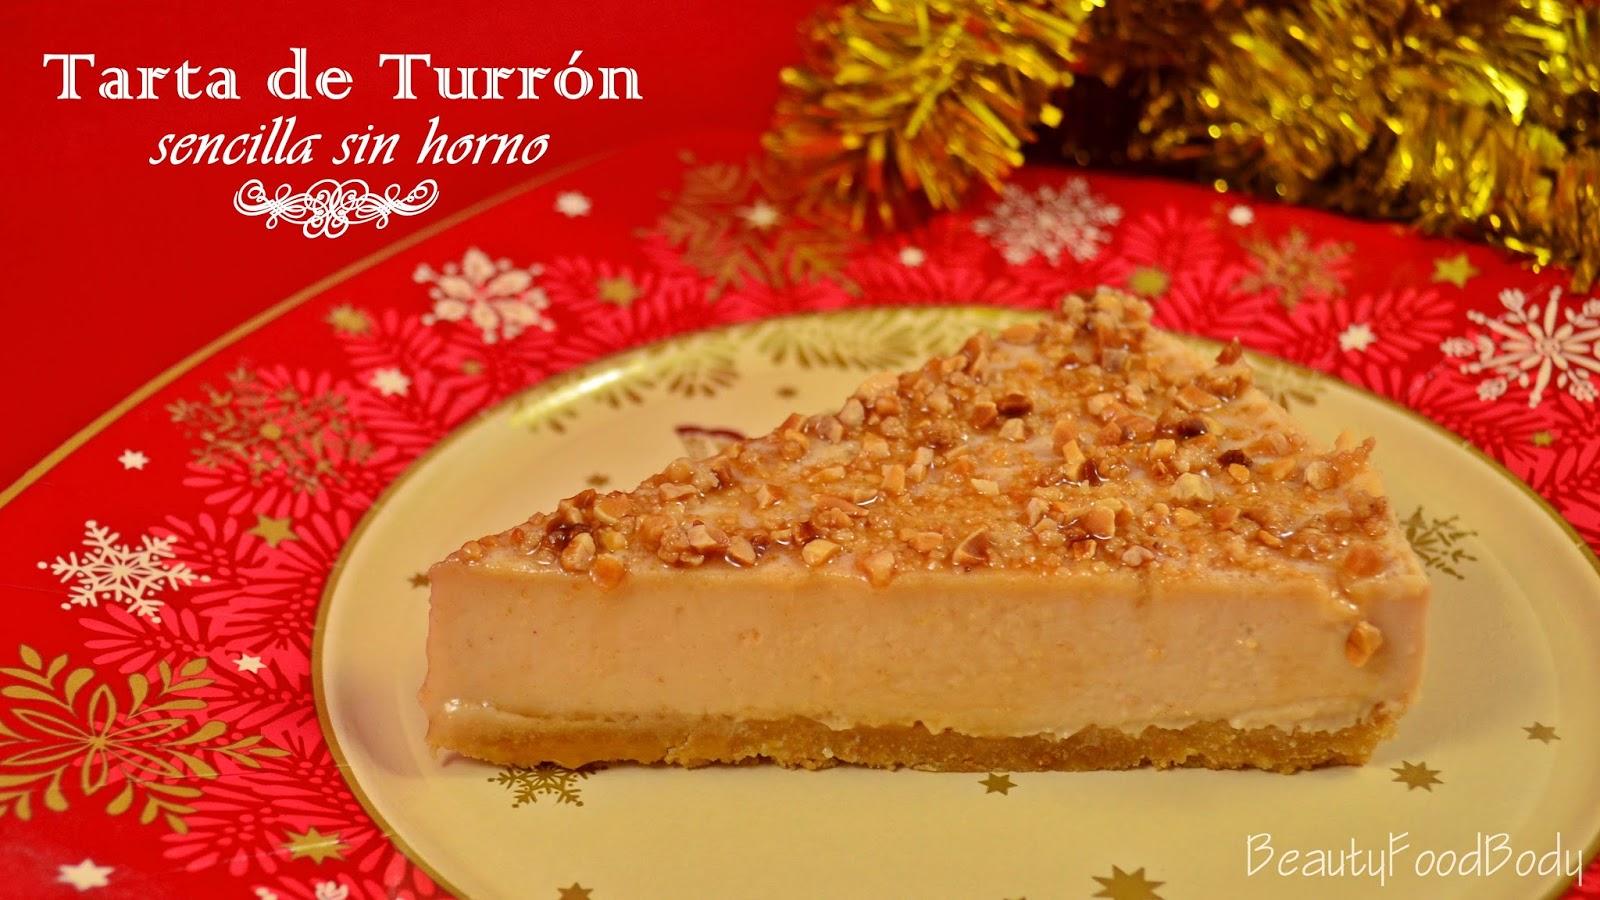 BFB rubibeauty tarta de turron sin horno sencilla facil rapida navidad receta navideña